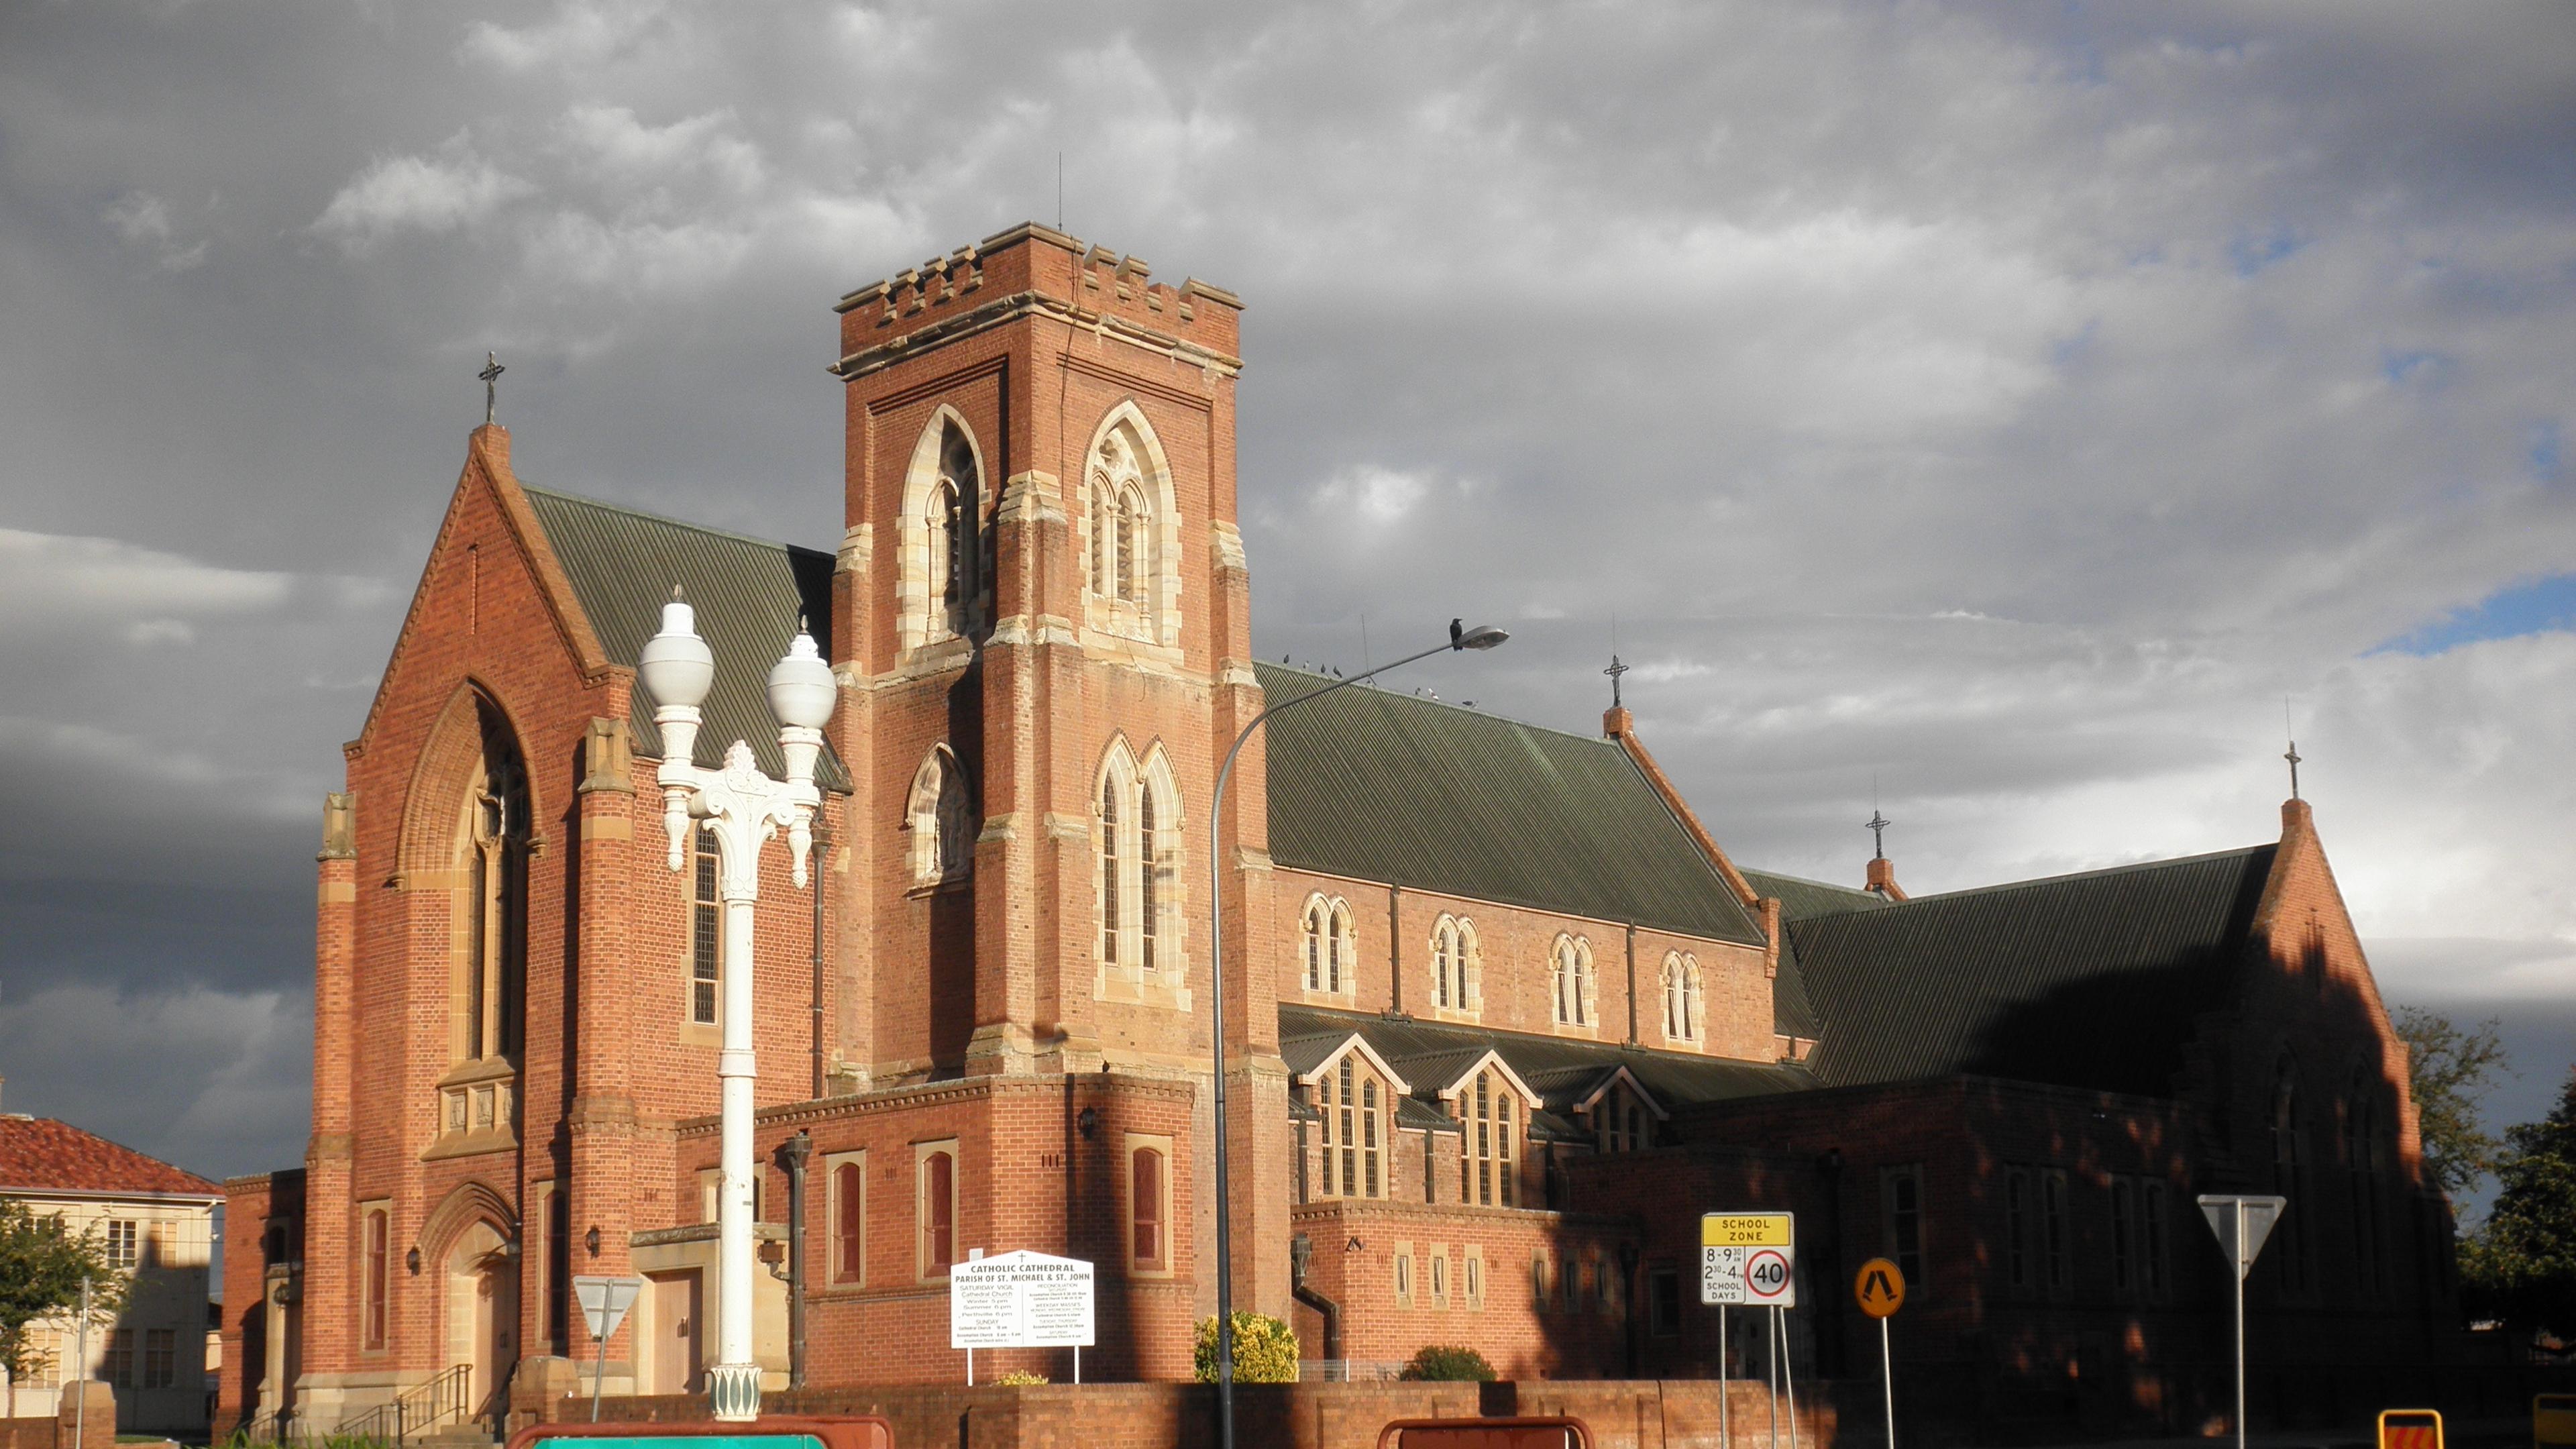 bathurst church city building 4k 1538064956 - bathurst, church, city, building 4k - City, Church, bathurst